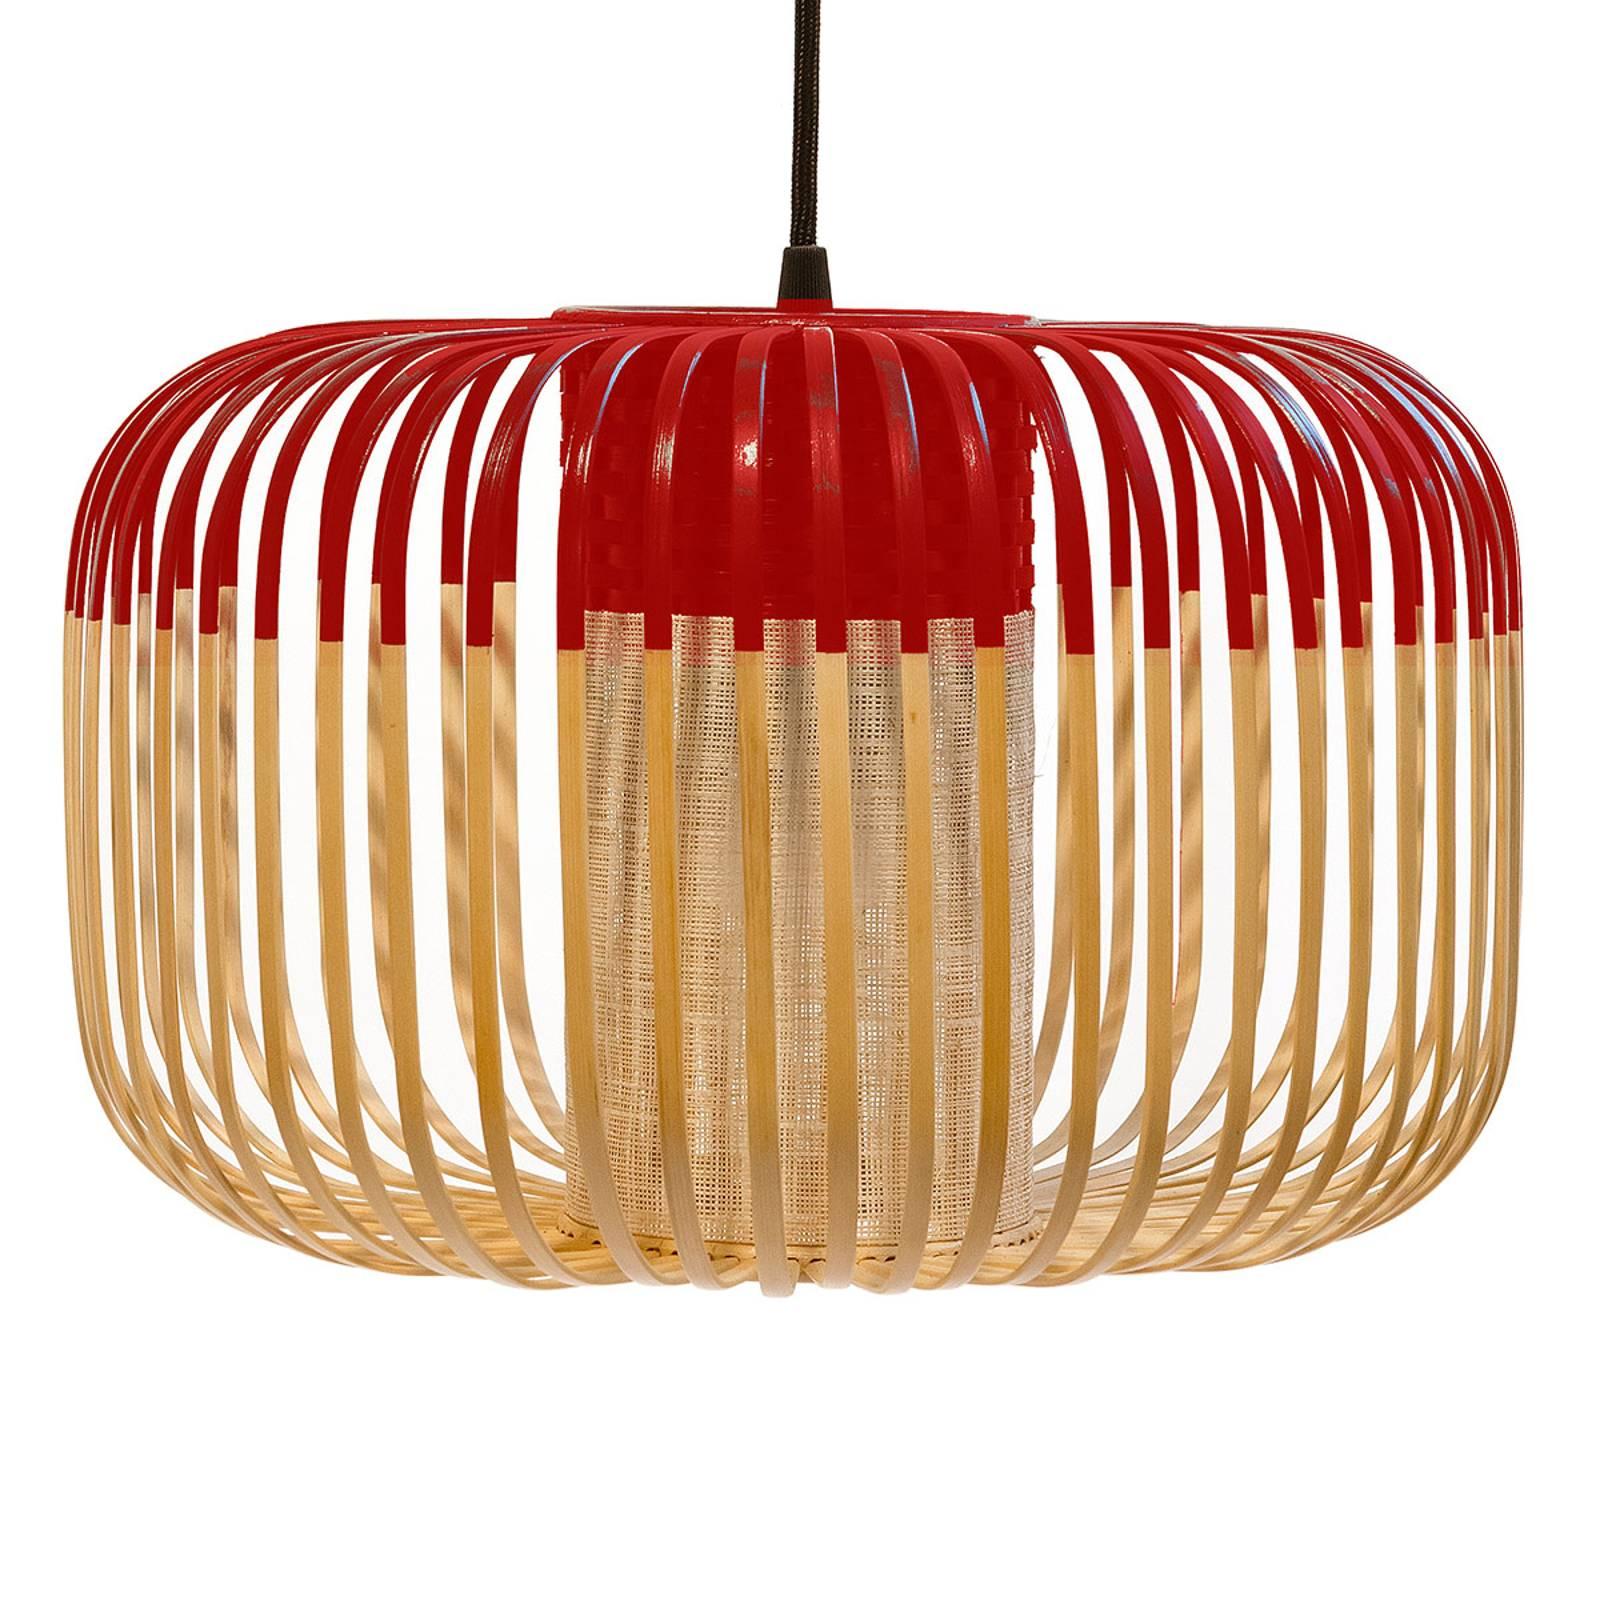 Forestier Bamboo Light S -riippuvalo 35cm punainen